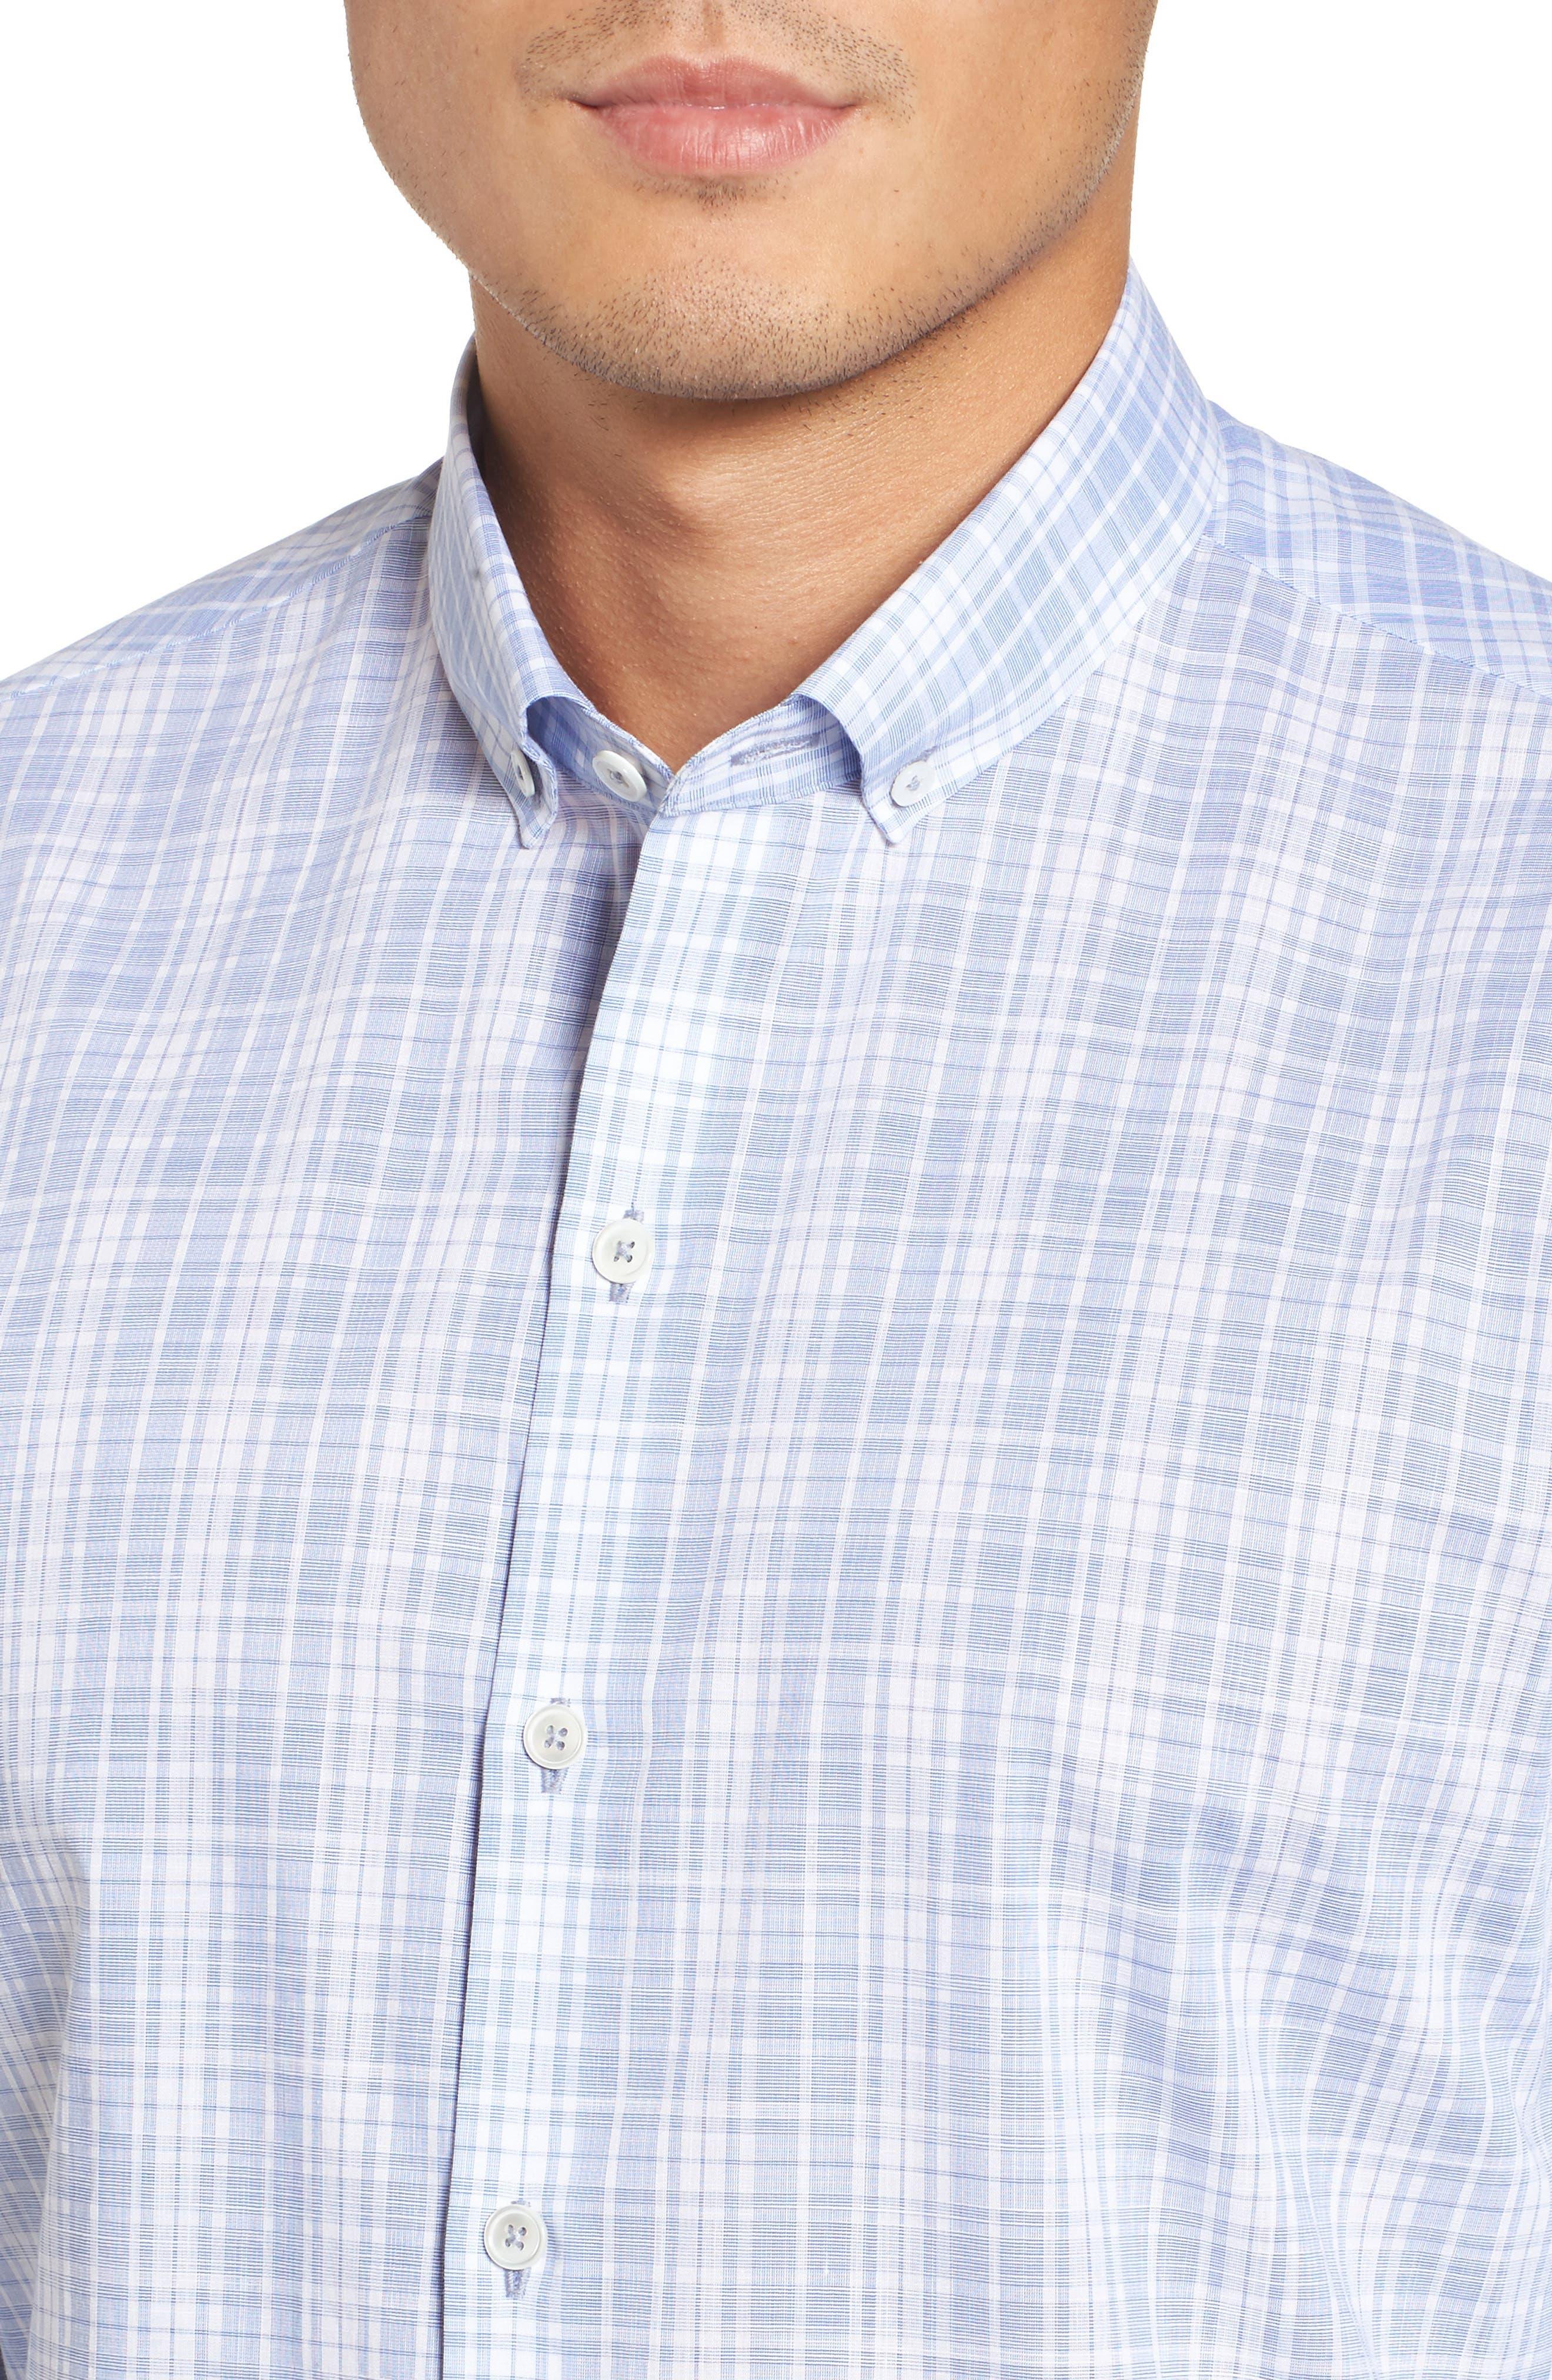 Cochran Slim Fit Plaid Sport Shirt,                             Alternate thumbnail 4, color,                             Blue